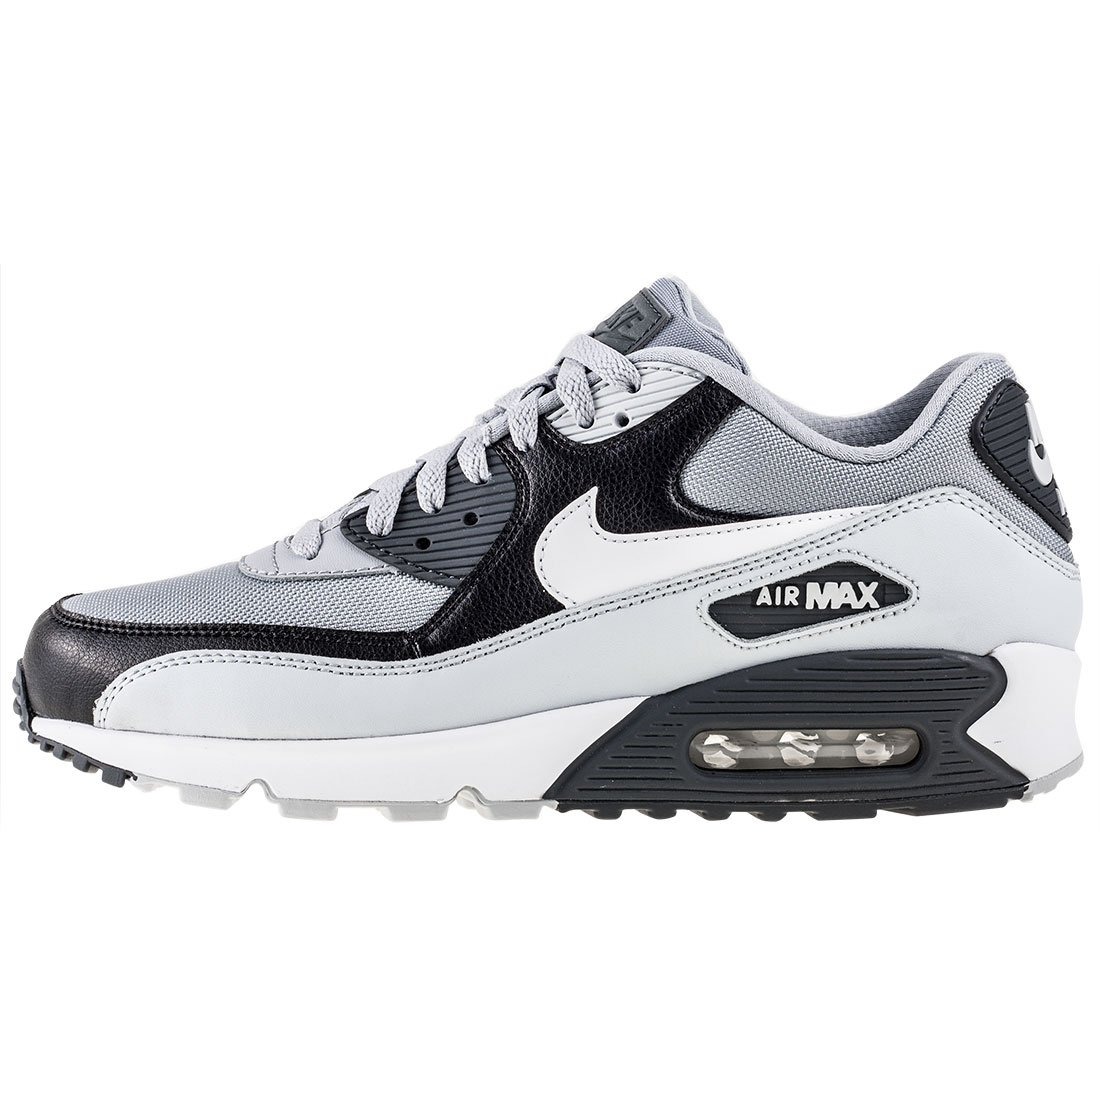 b8febc2c894 ... Nike Air Max 90 Essential casual lifestyle sneakers sneakers sneakers  wolf grey white-purple ...